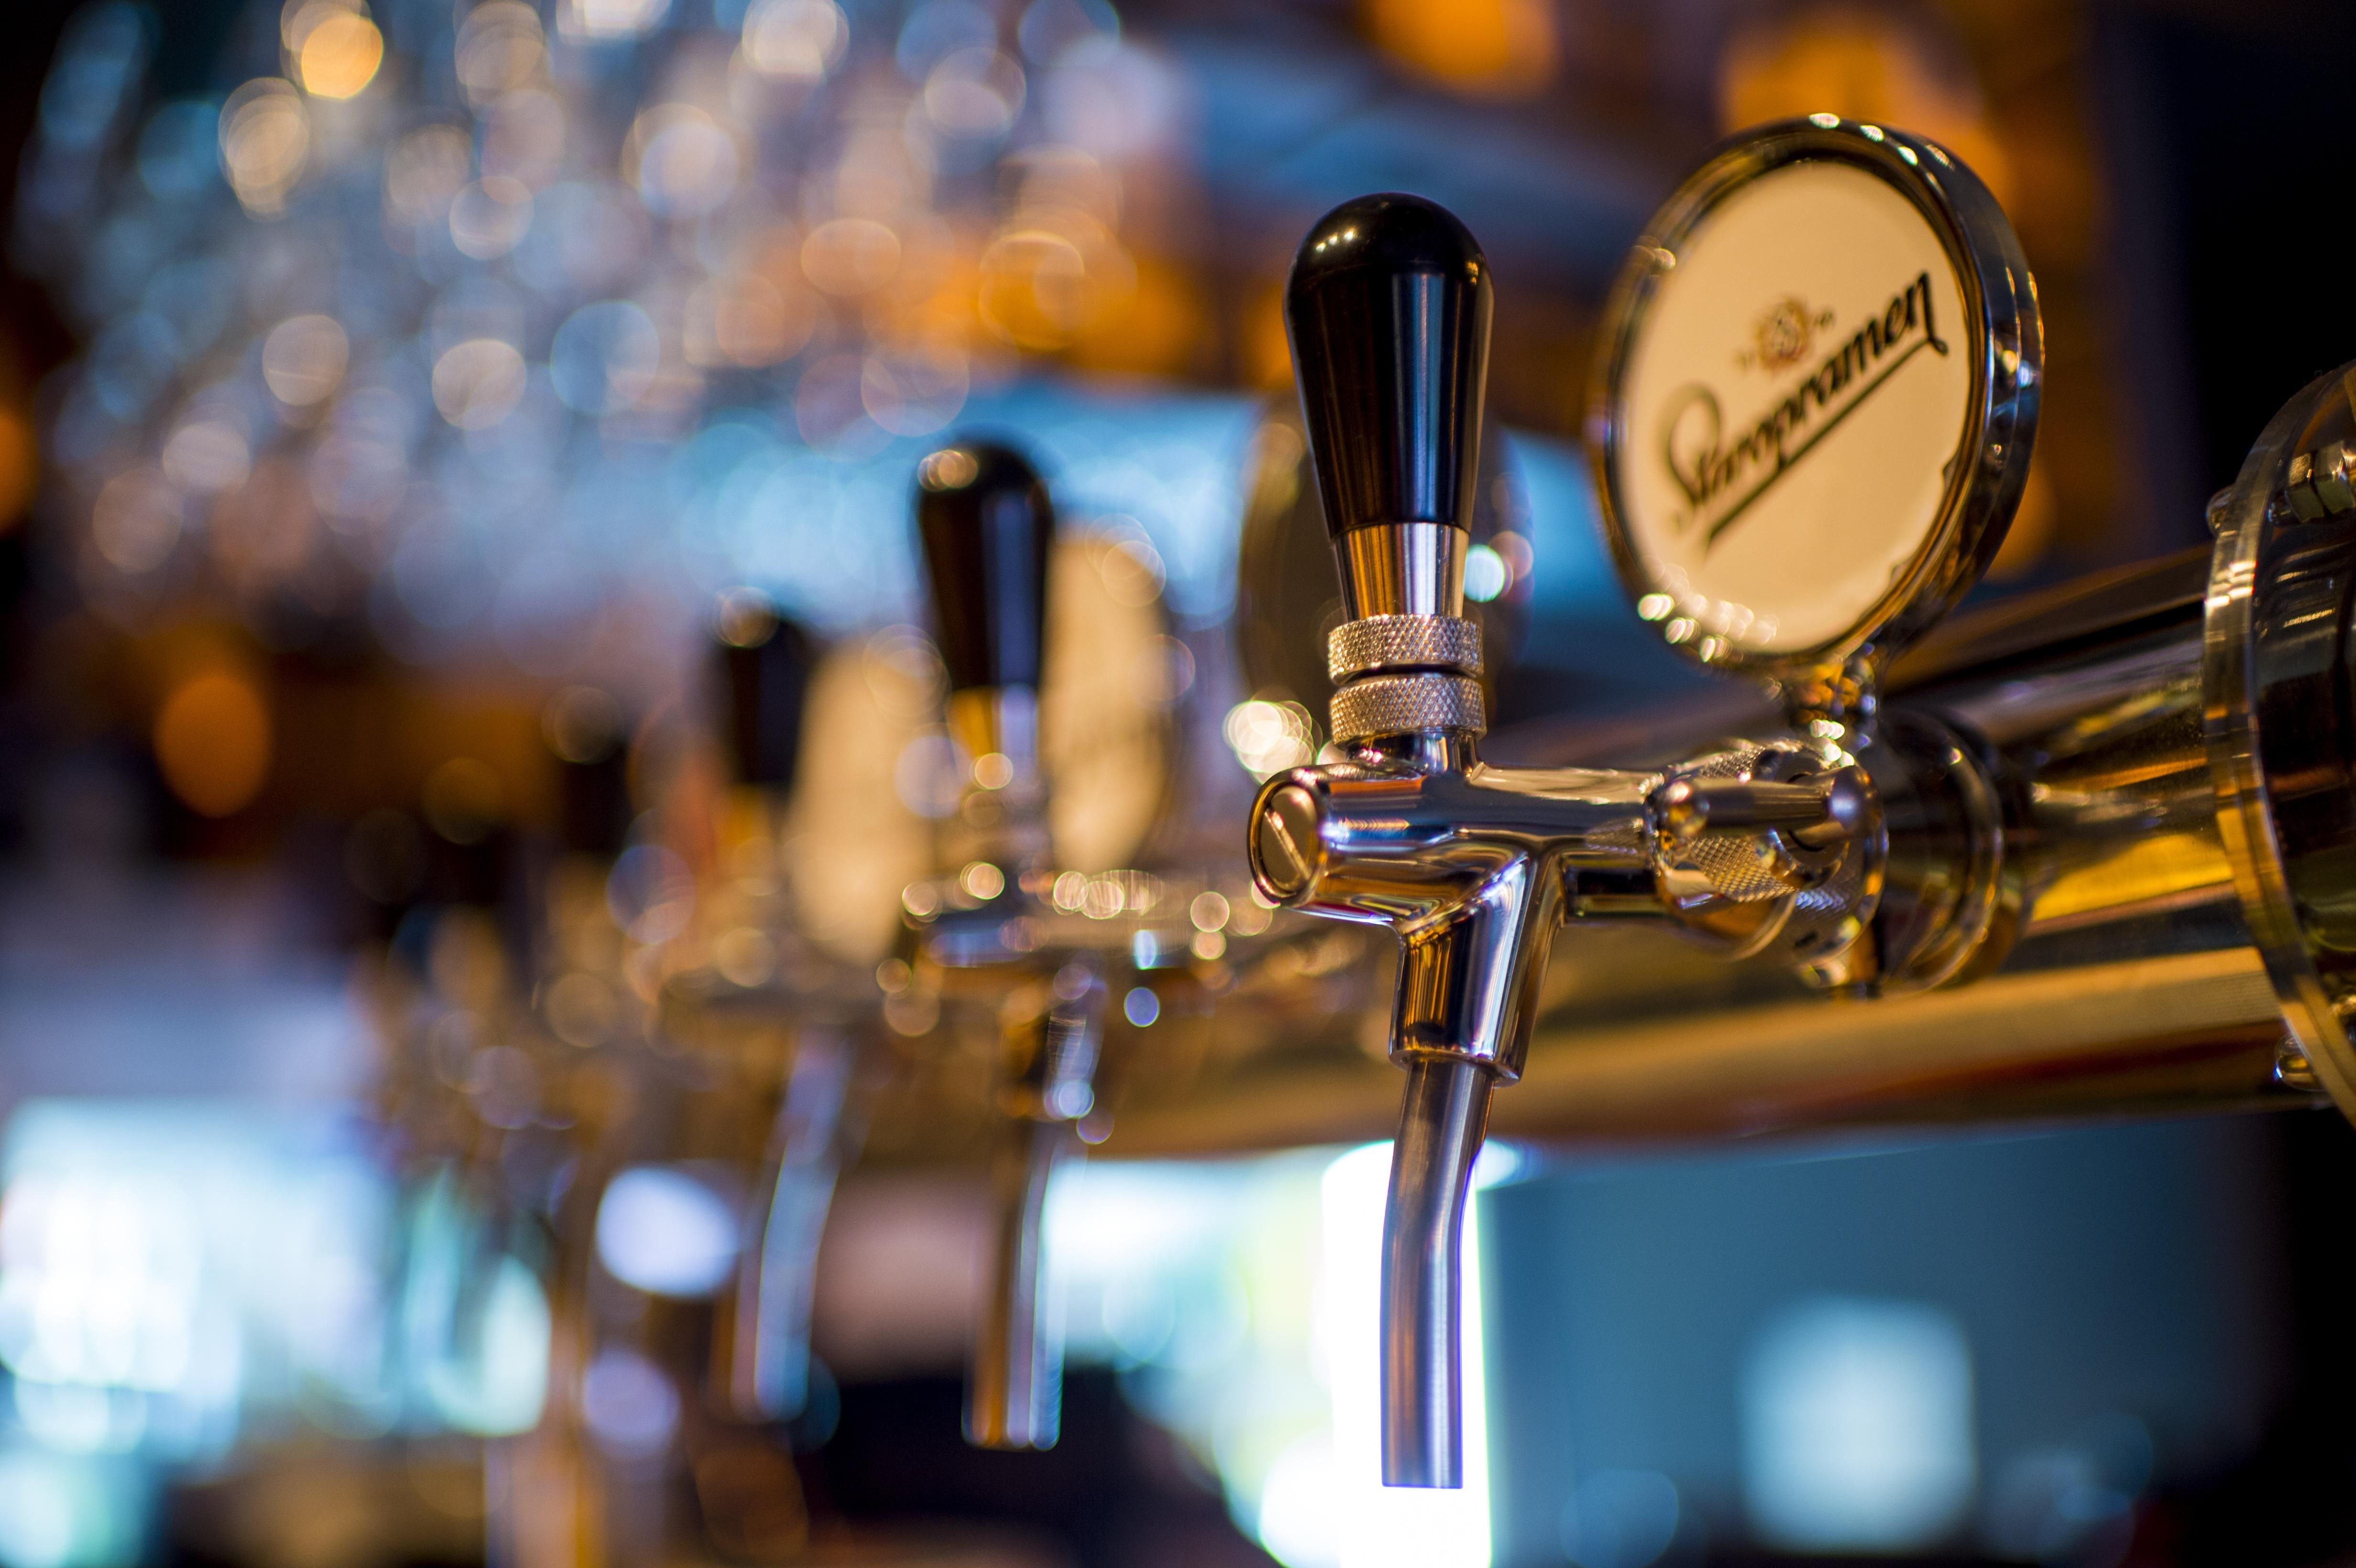 https://static.pexels.com/photos/159291/beer-machine-alcohol-brewery-159291.jpeg